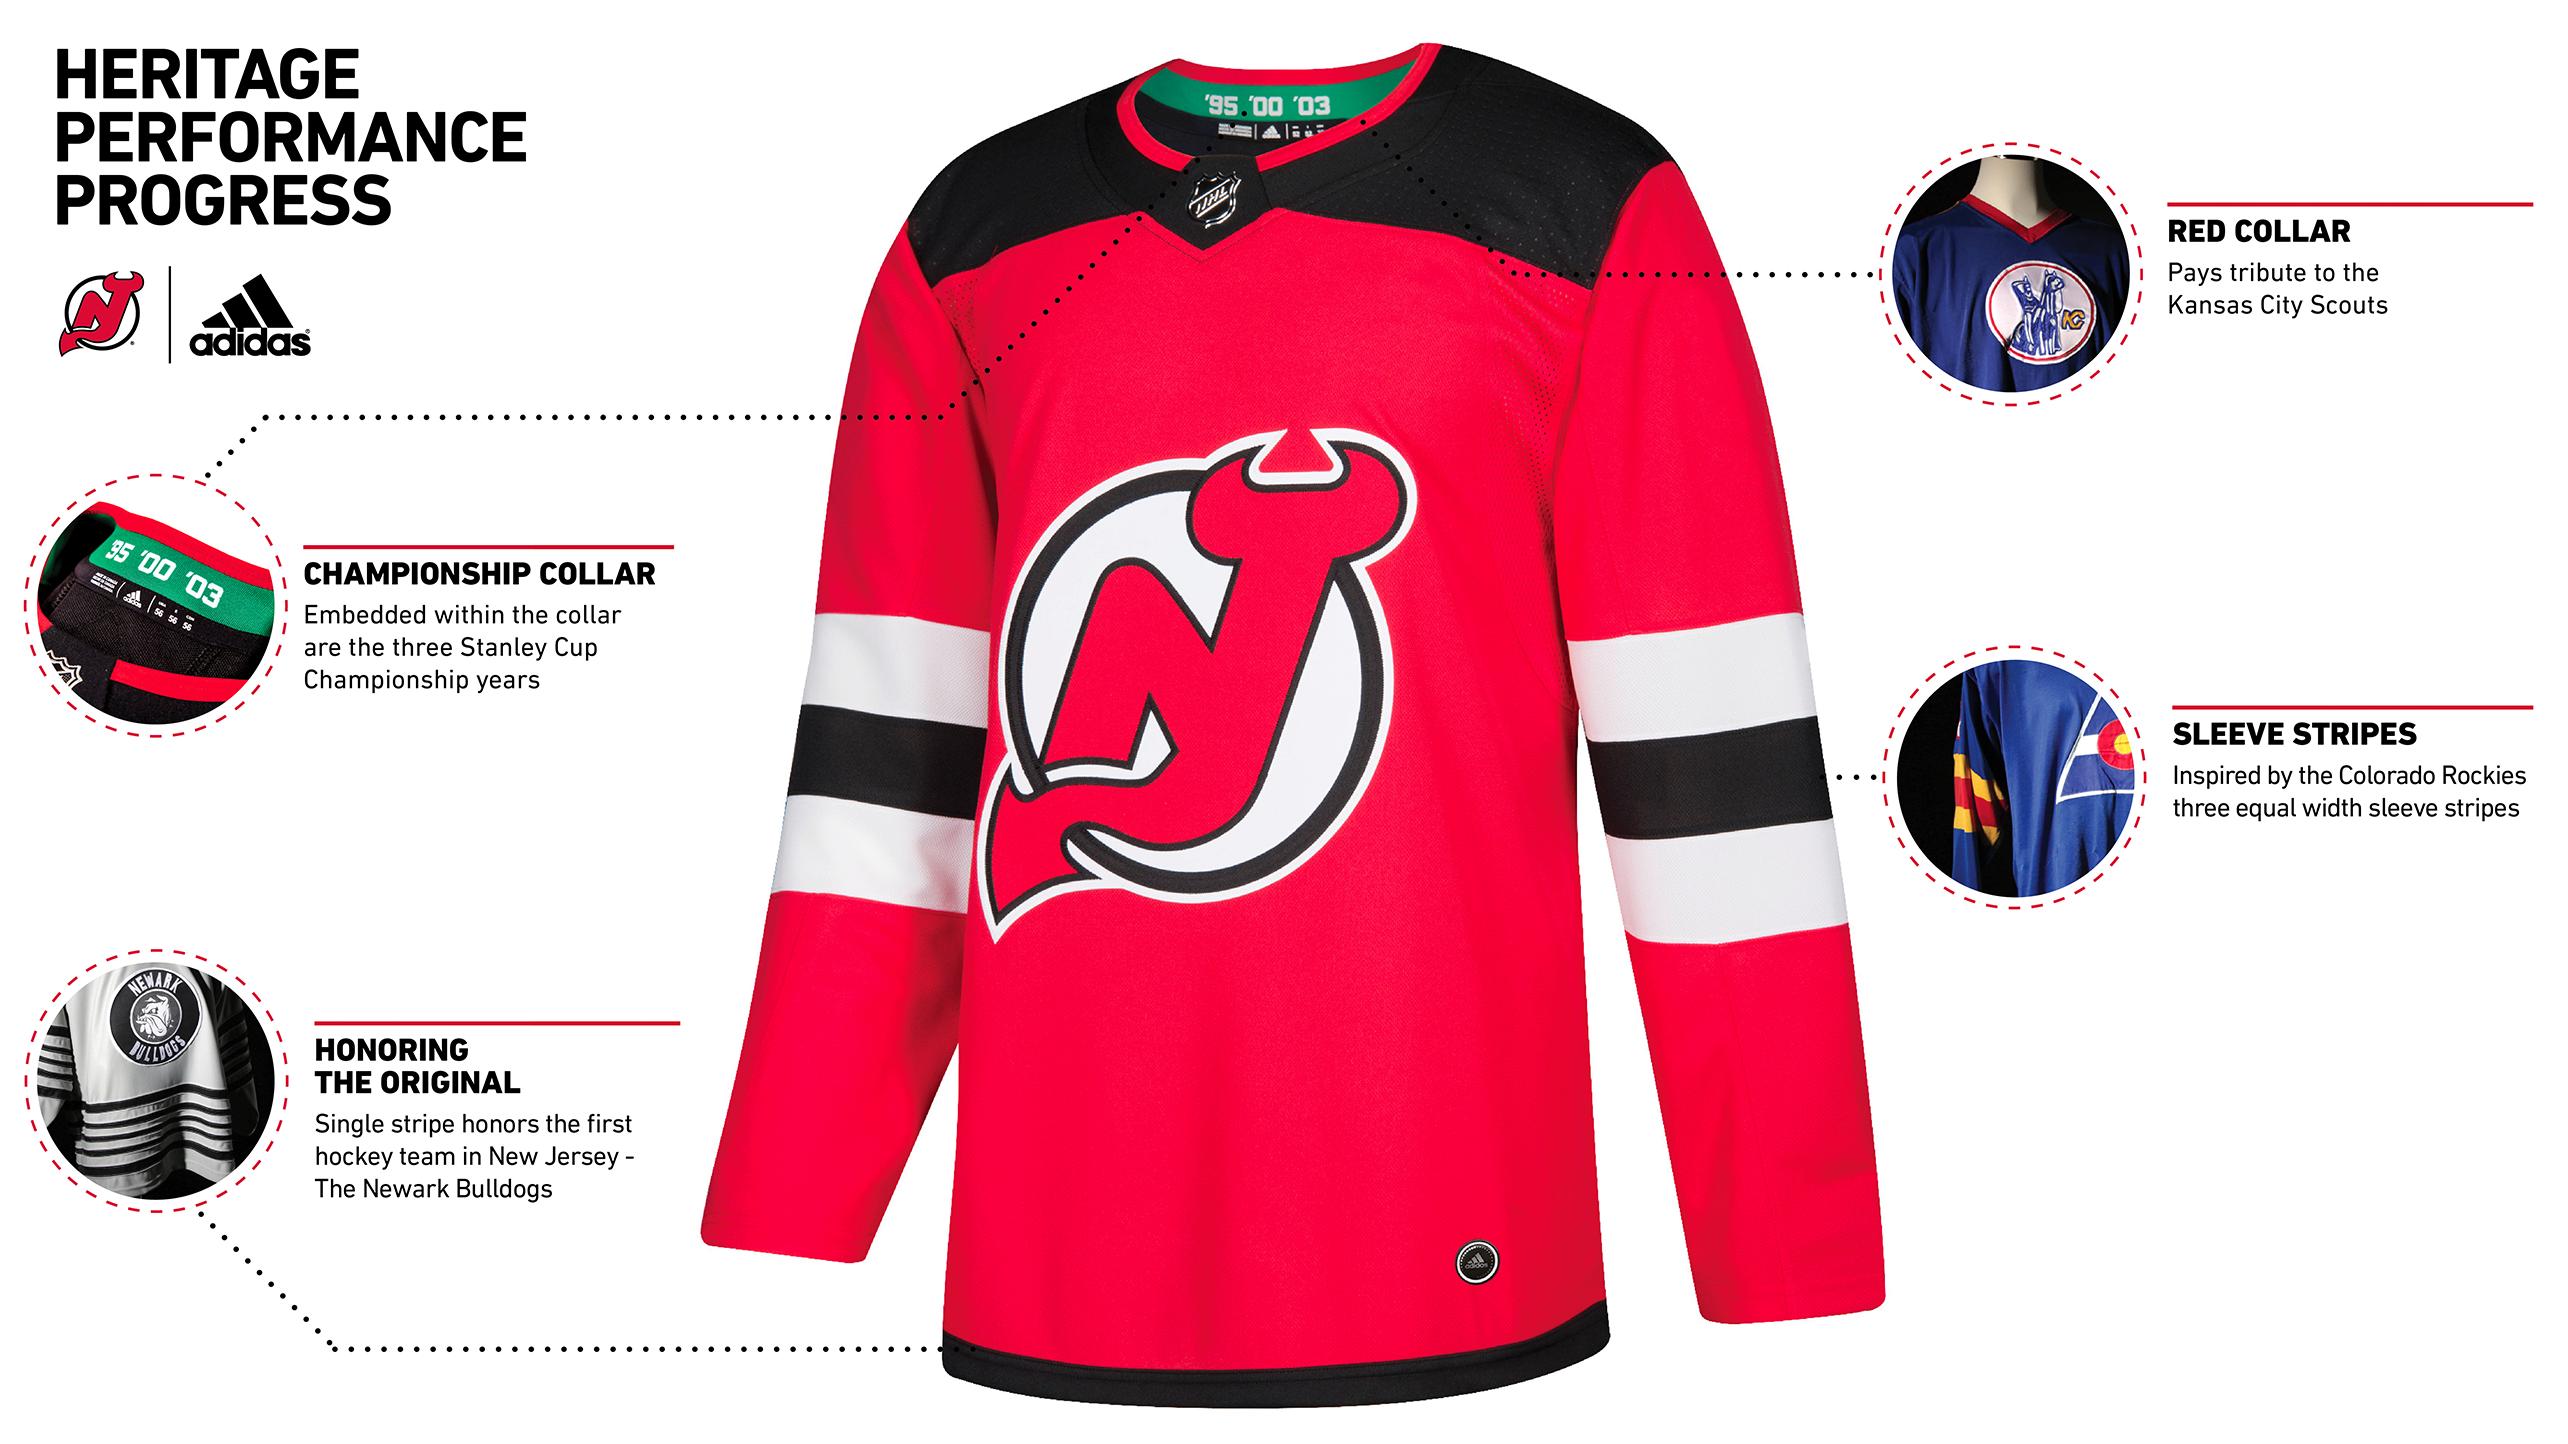 New Jersey Devils - Jersey Heritage